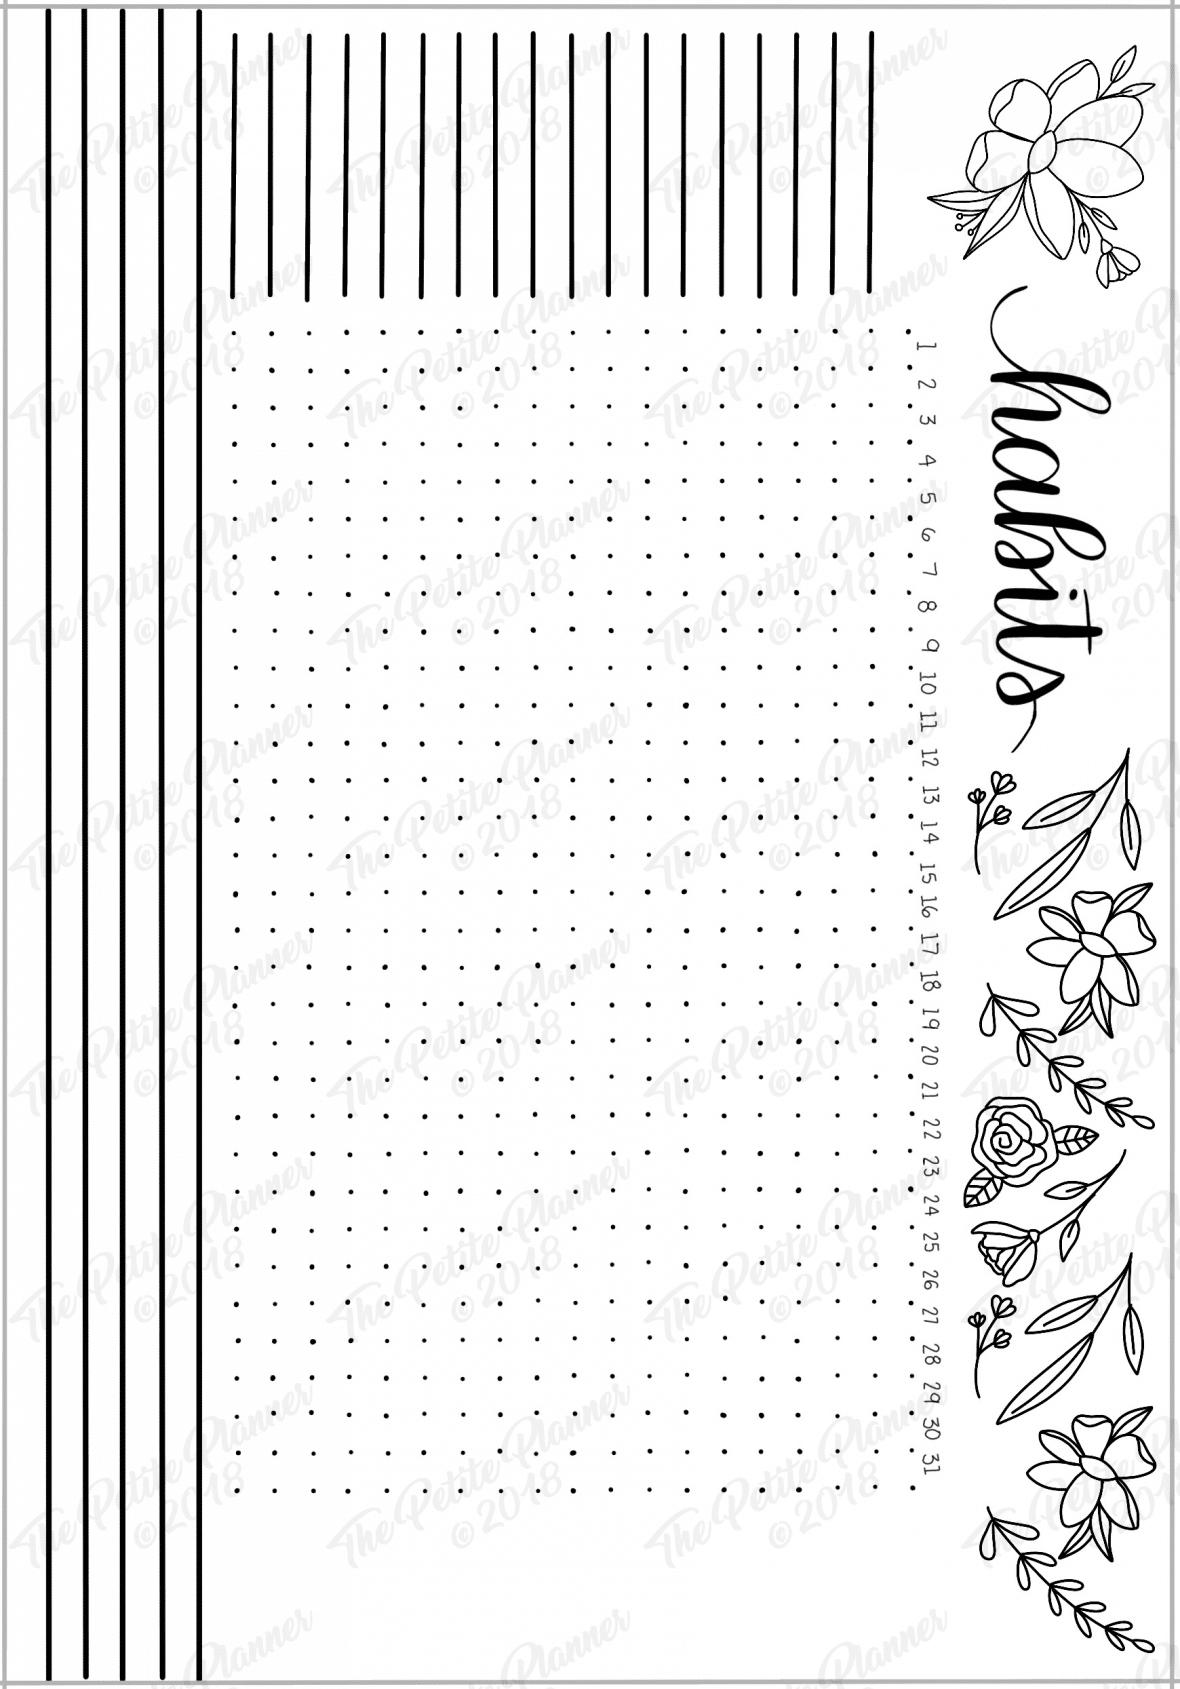 March 2019 Printable Bullet Journal Setup - The Petite Planner